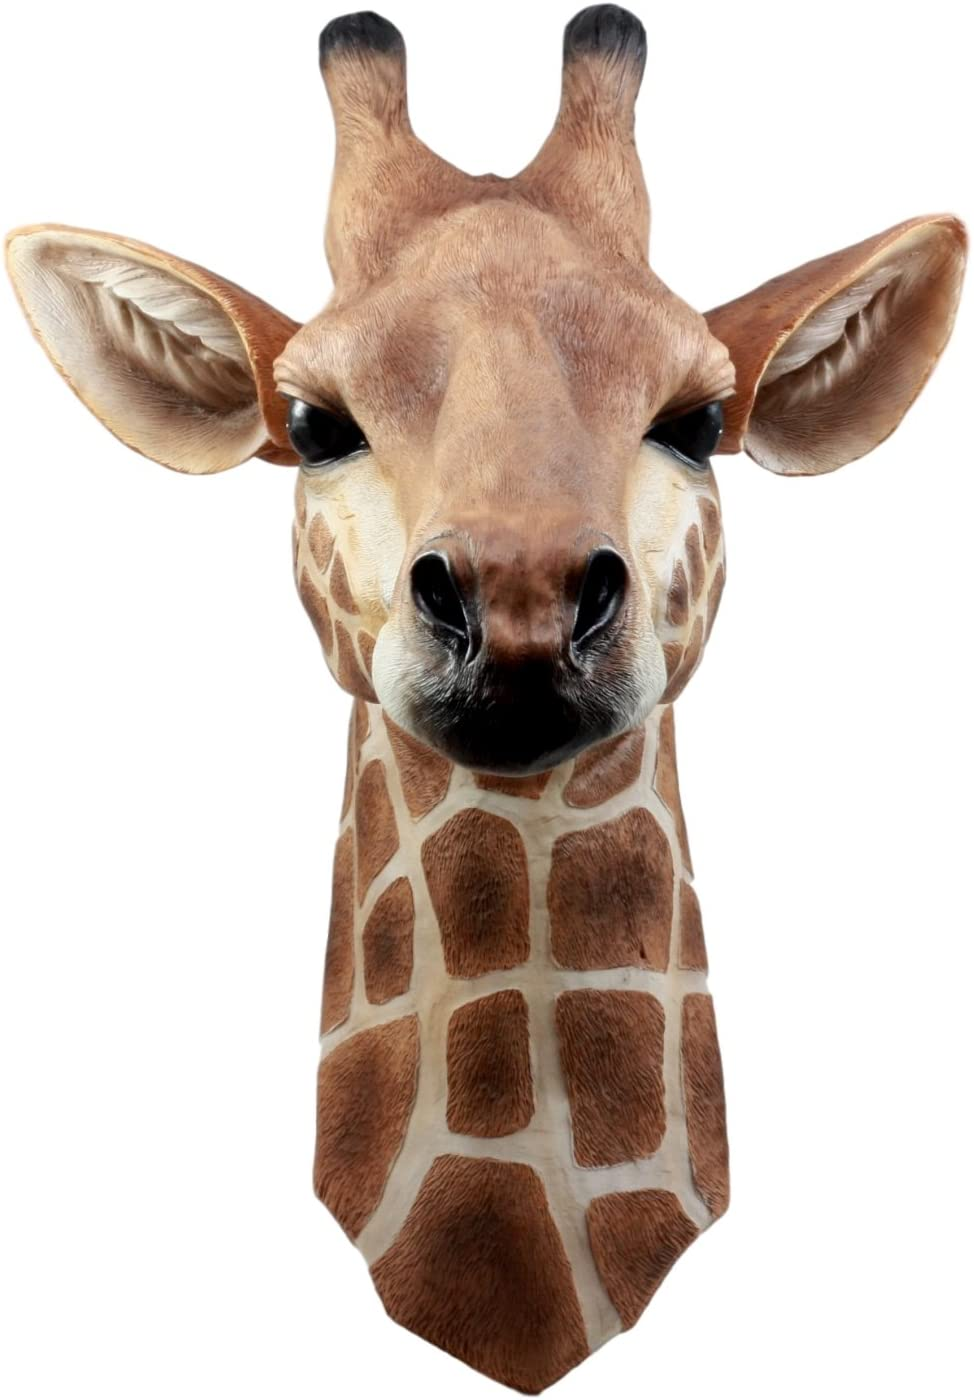 Ebros Safari Giraffe Head Trophy Taxidermy Wall Decor Wildlife Animal Sculpture Hanging Plaque Figurine